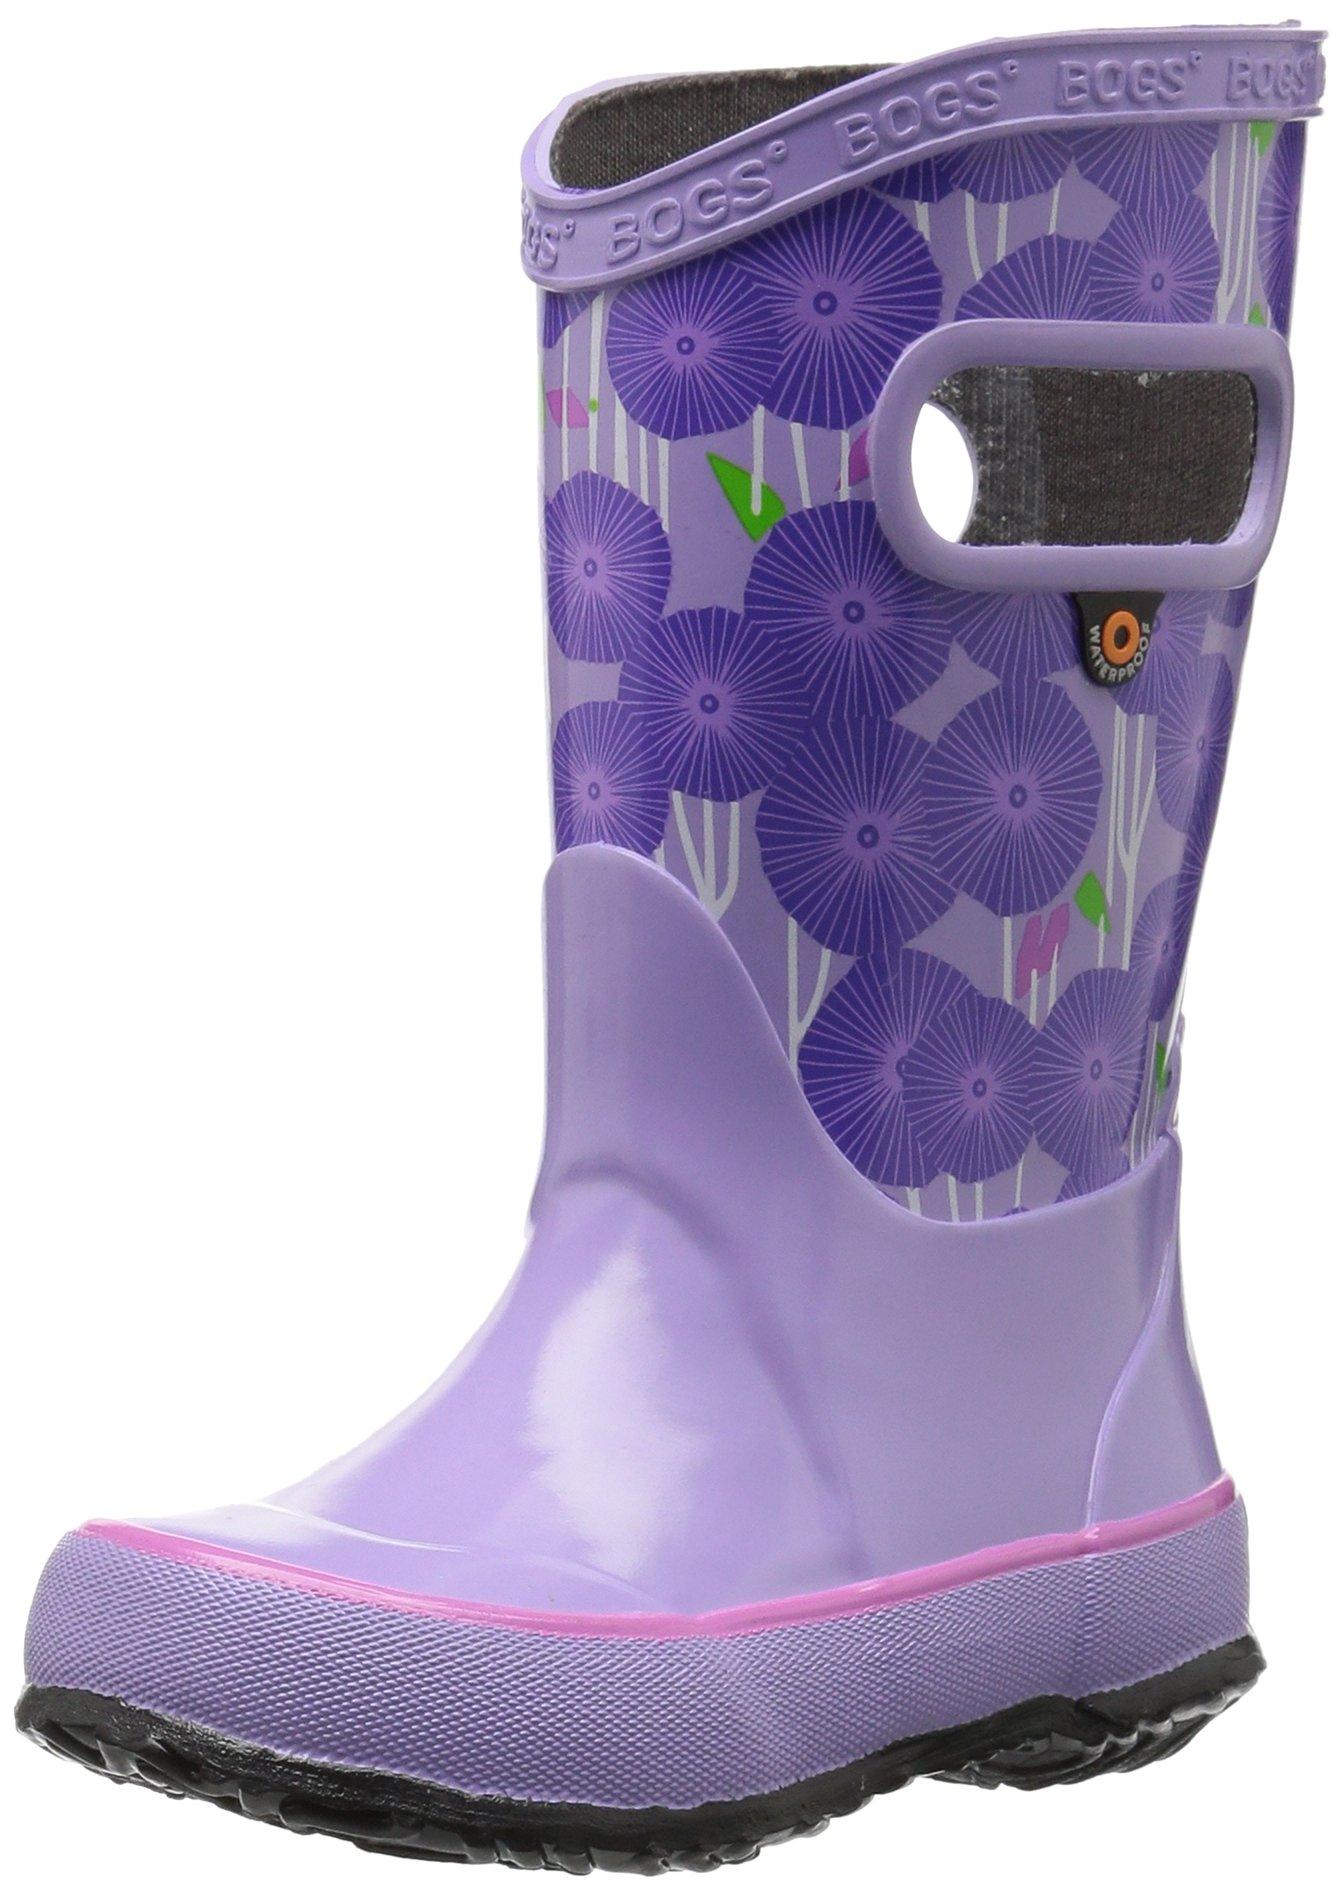 Bogs Kids Rubber Waterproof Rain Boot for Boys and Girls , Aster Print/Lavender/Multi, 4 M US Big Kid